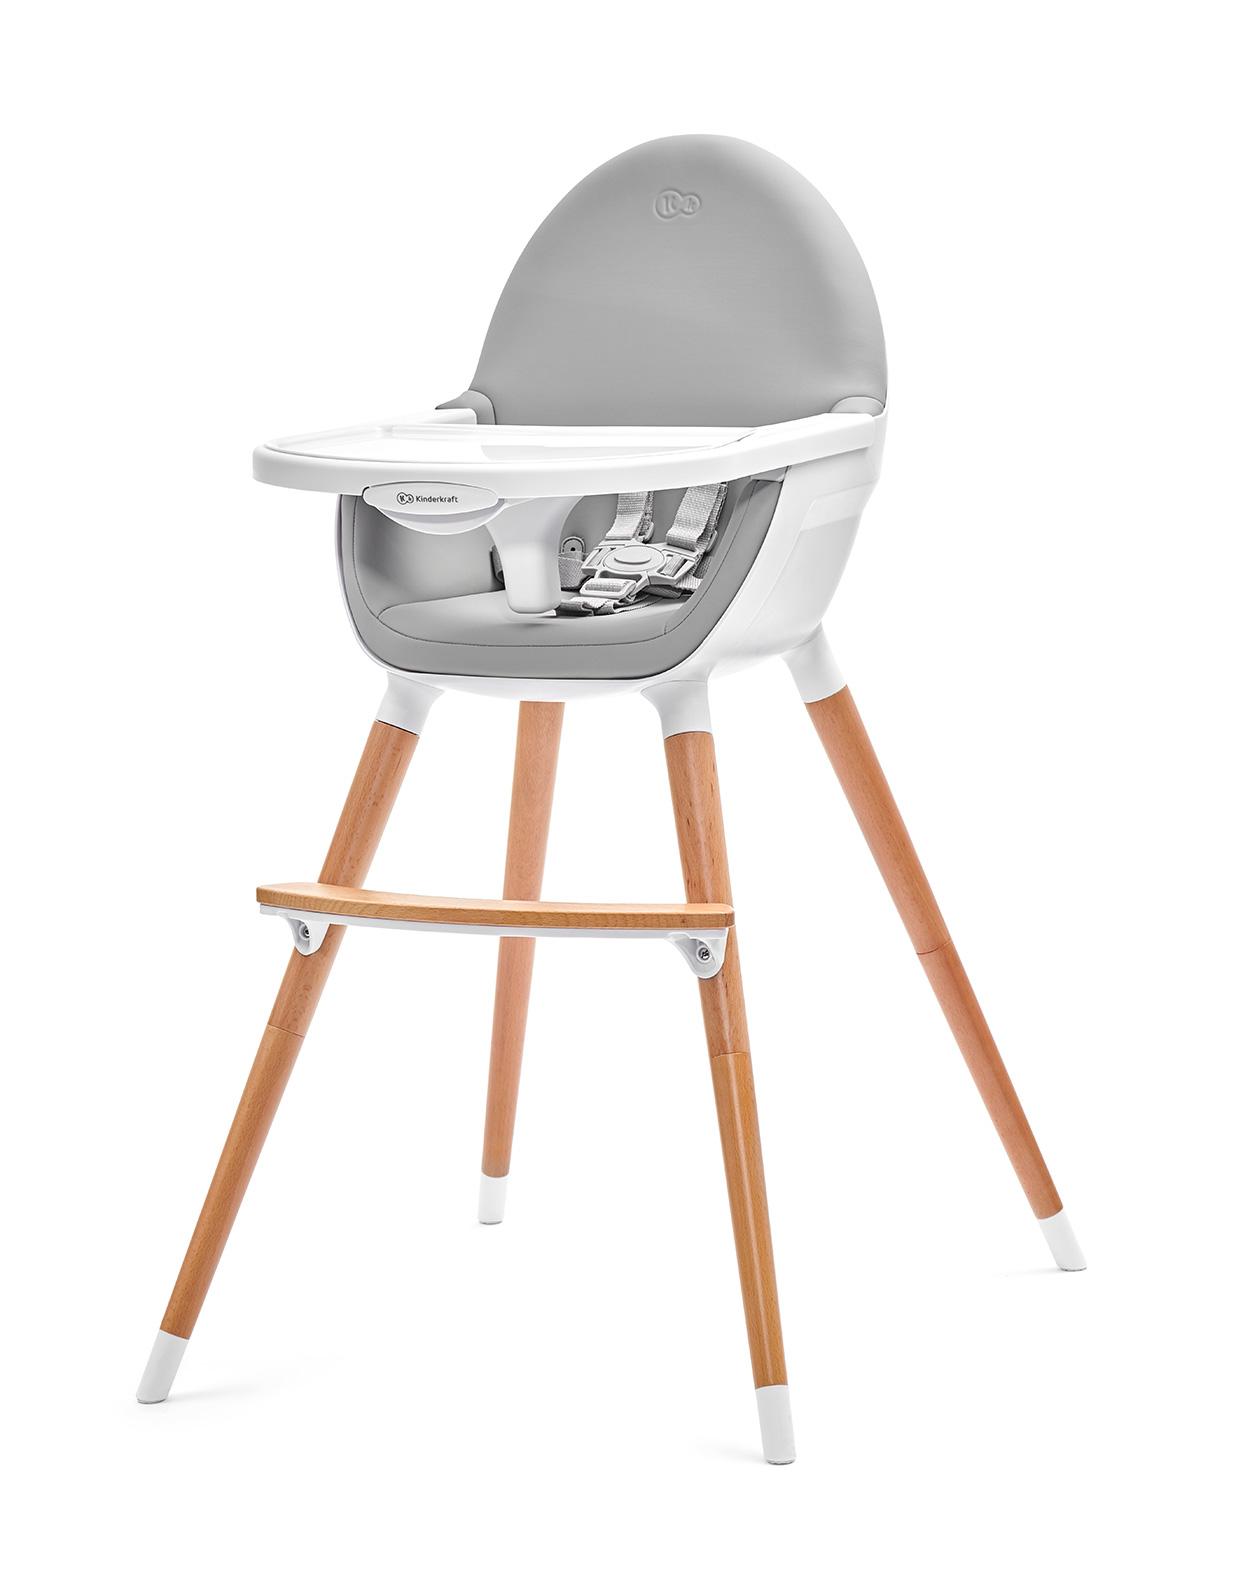 High chair FINI KKKFINIBLK0000 KKKFINIFBLK000 KKKFINIGRY0000